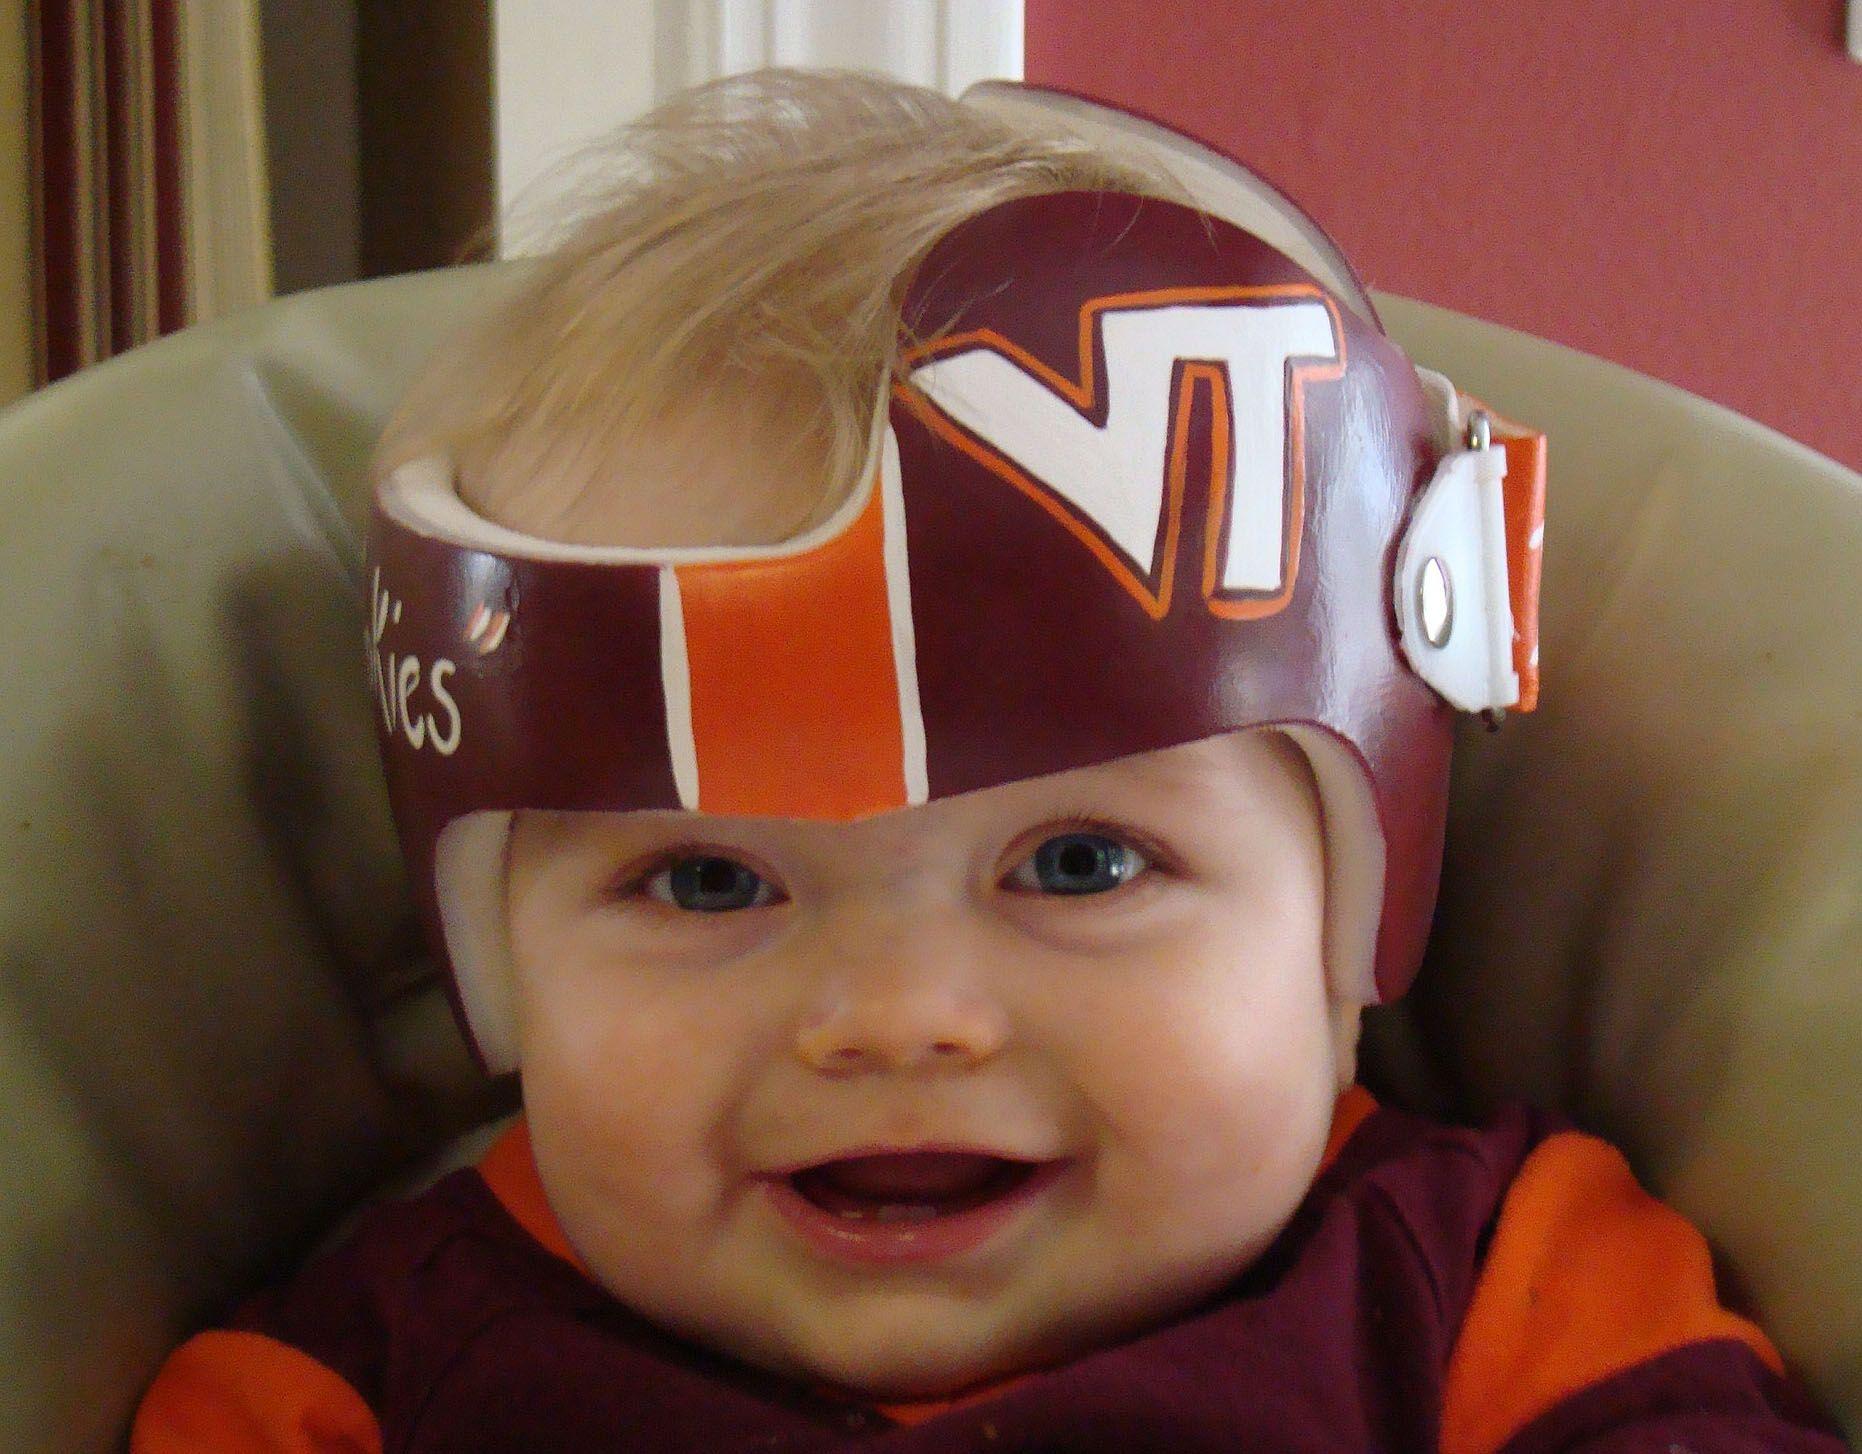 Virginia Tech Cranial Band DOC band/helmet https//www